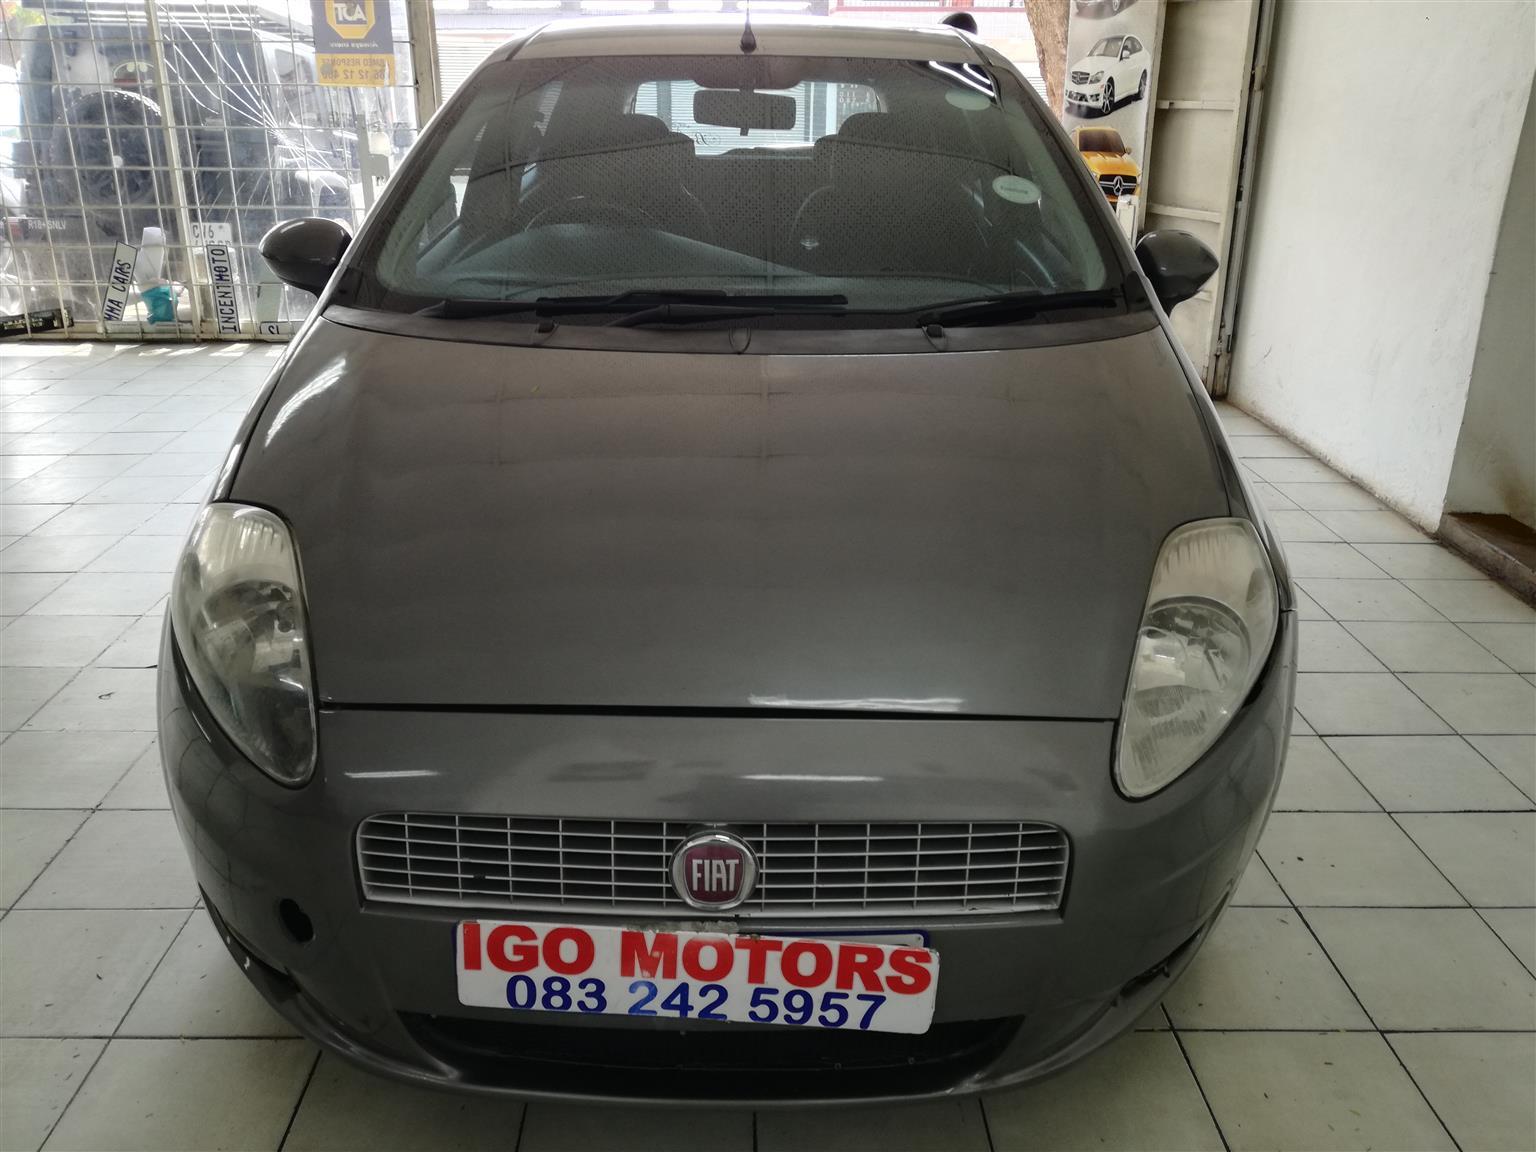 2012 Fiat Pinto 1.4Hatch Pop Mechanically perfect